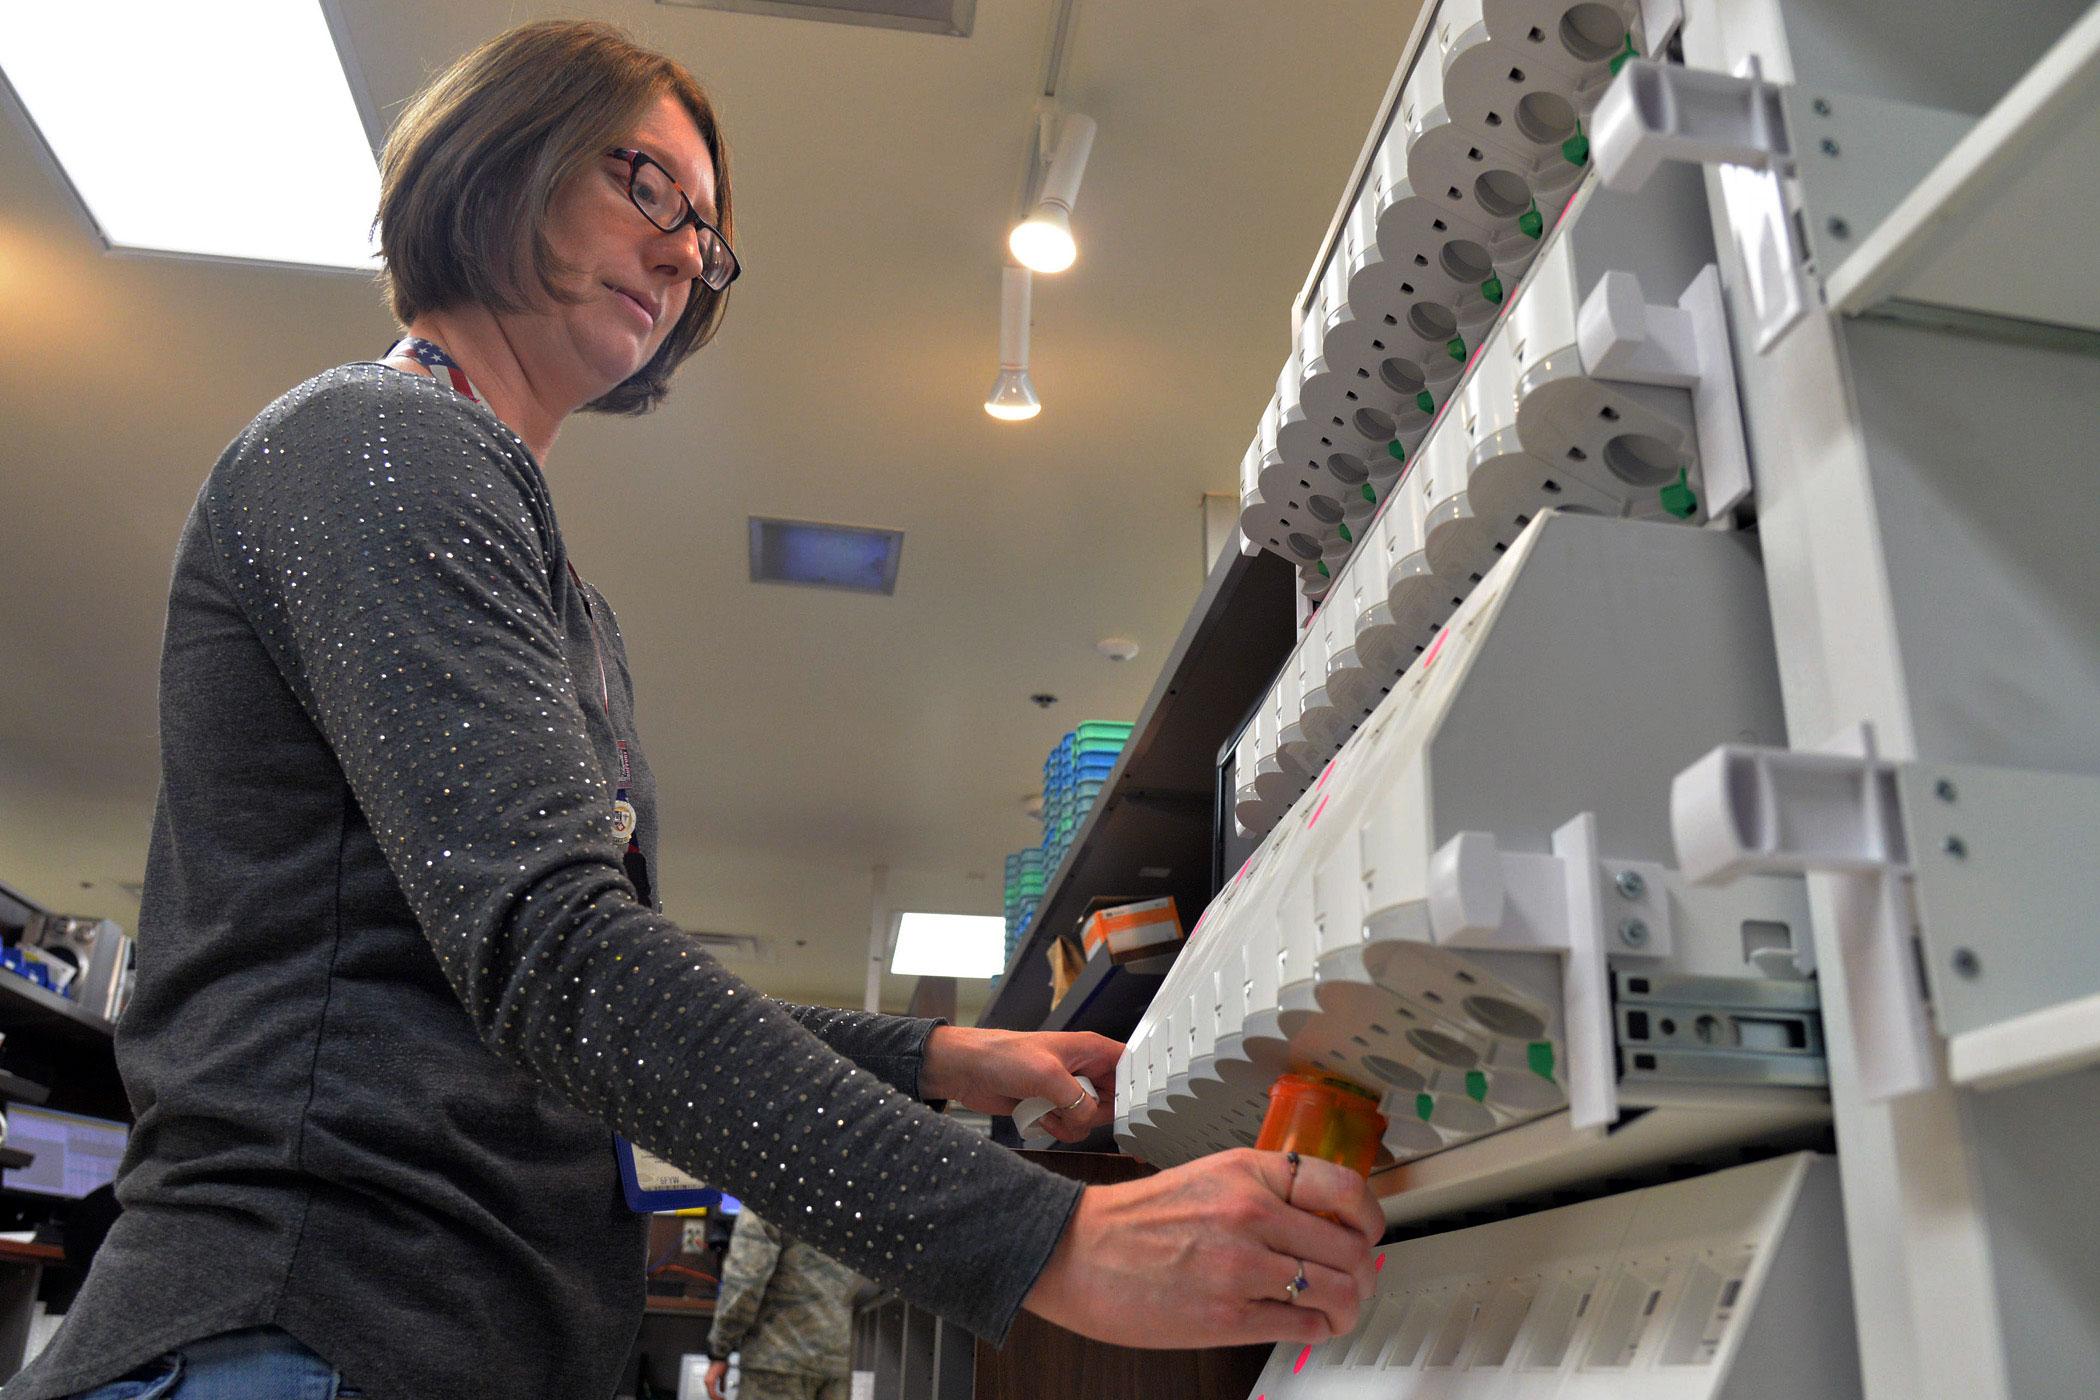 Diabetes Cholesterol Drug Prices Cut Under Tricare